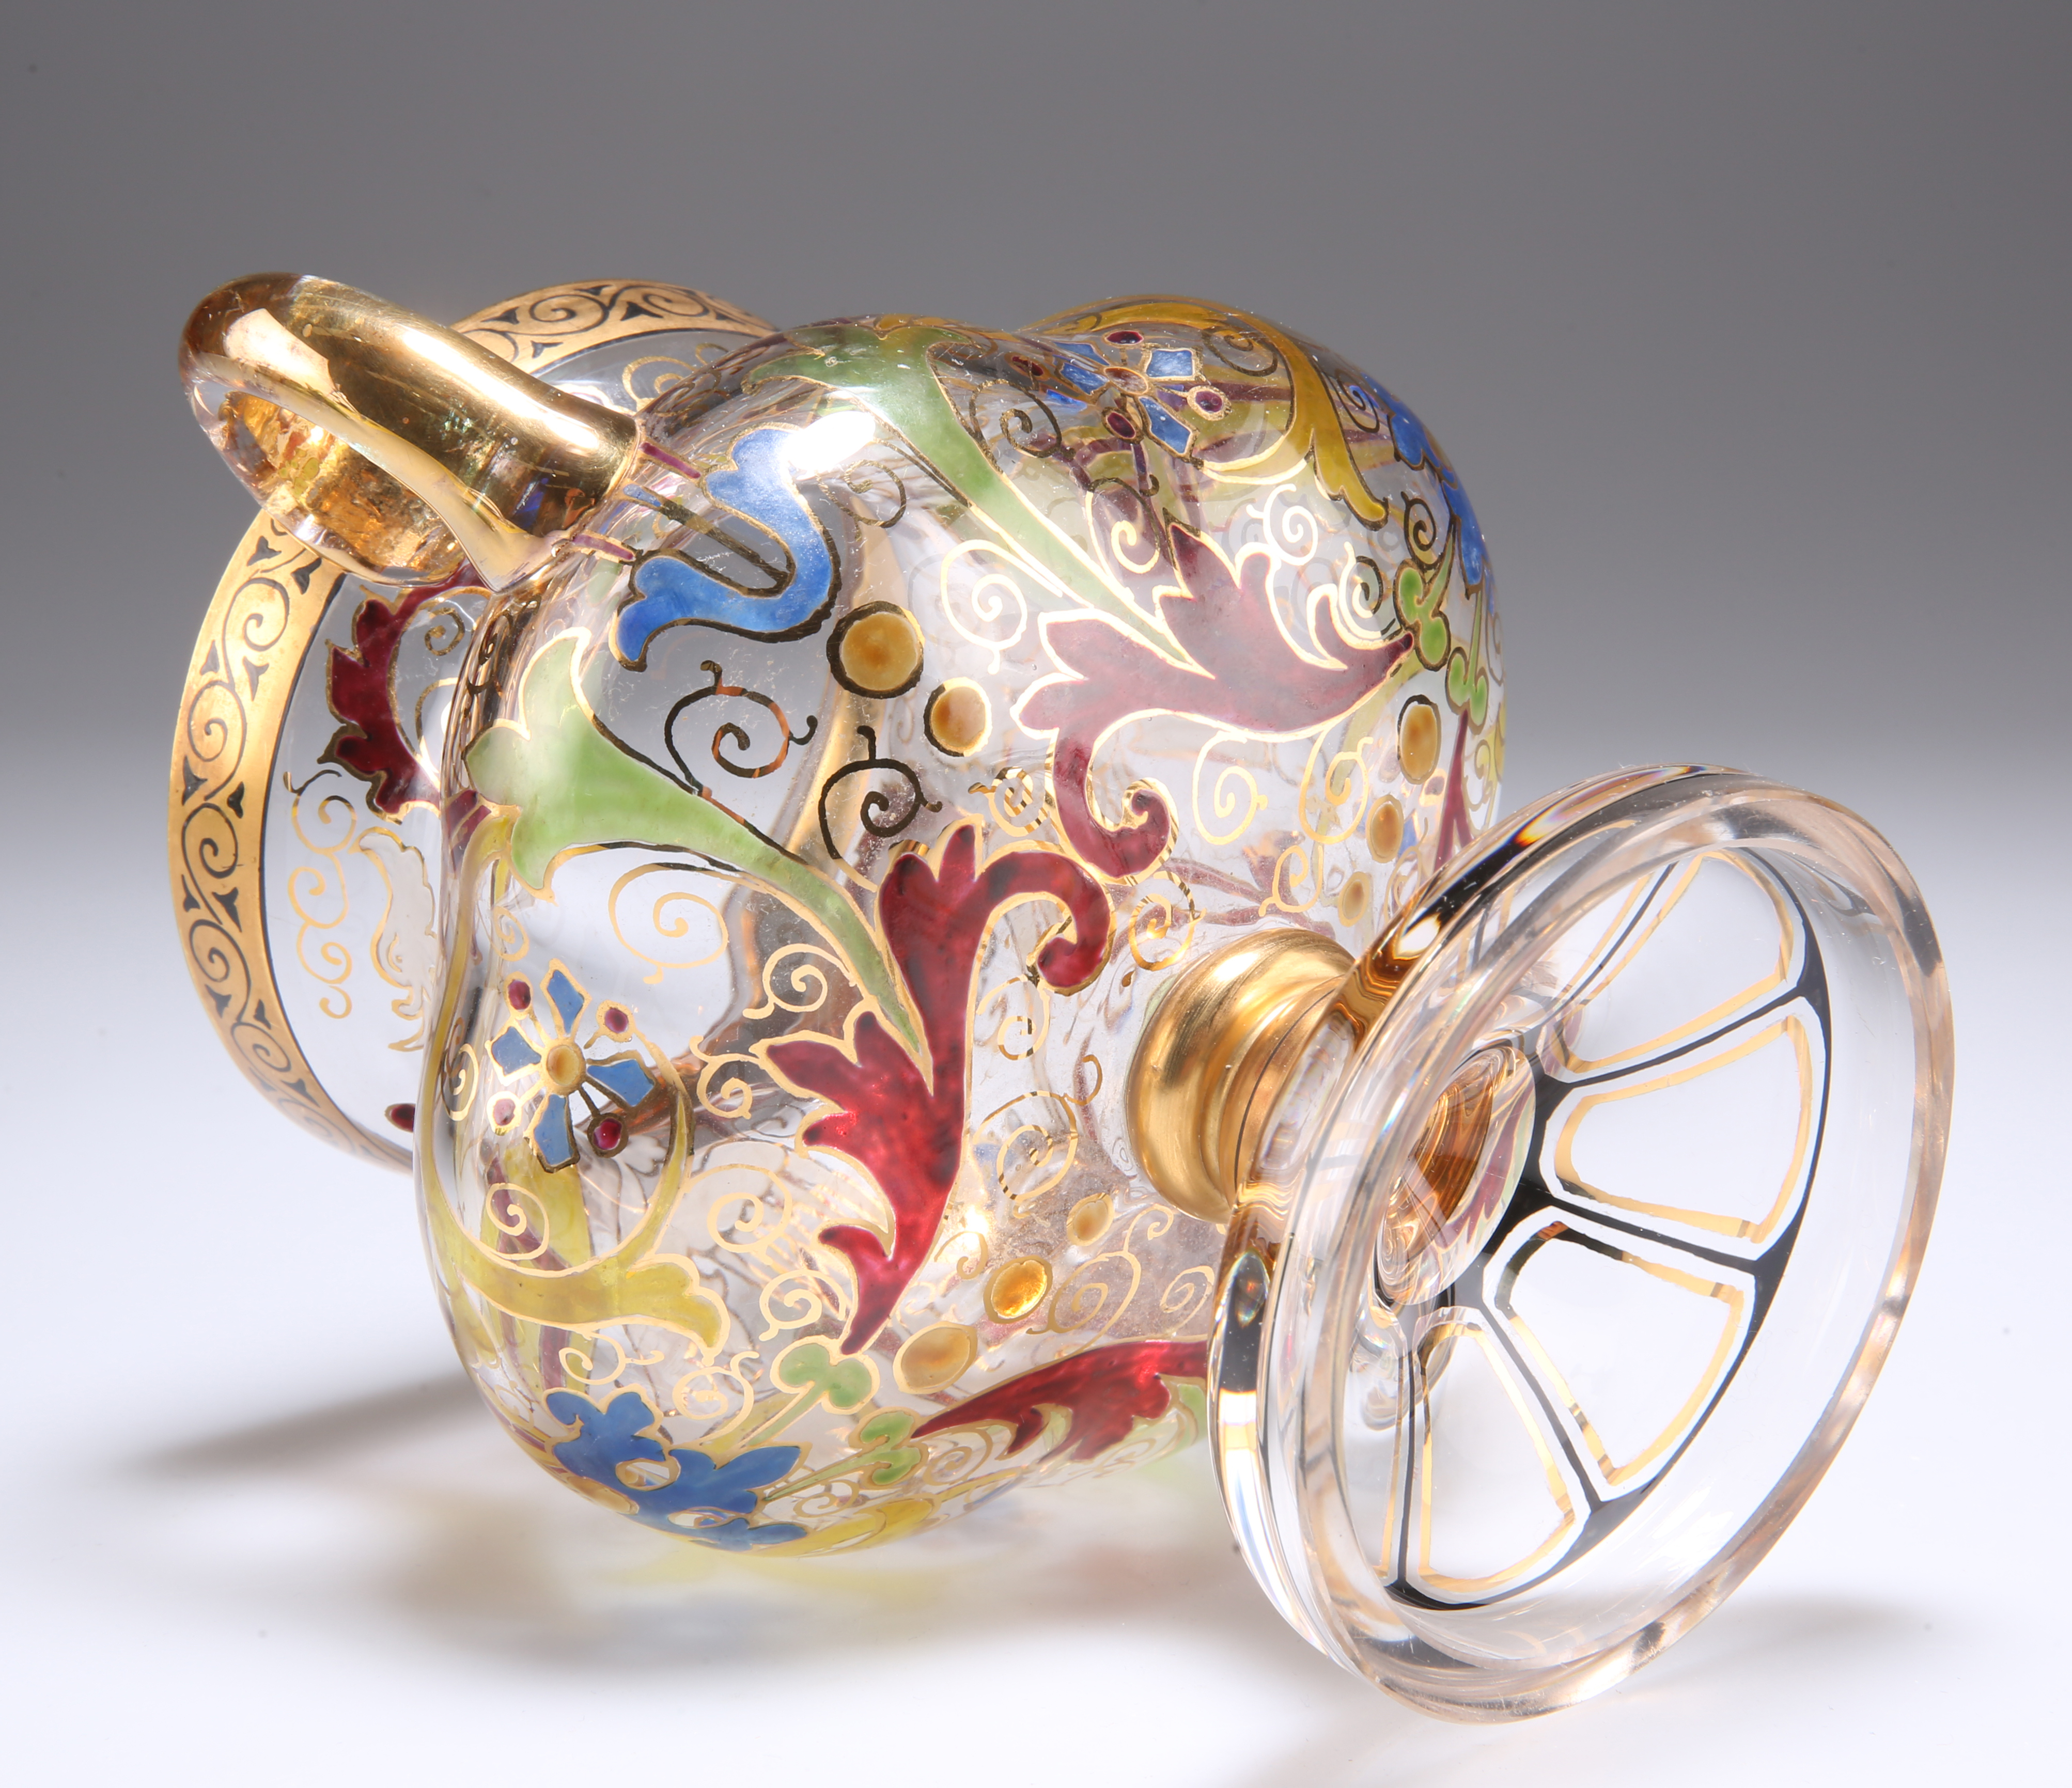 A BOHEMIAN STEINSCHONAU ART NOUVEAU TWO-HANDLED GLASS CUP - Image 5 of 6